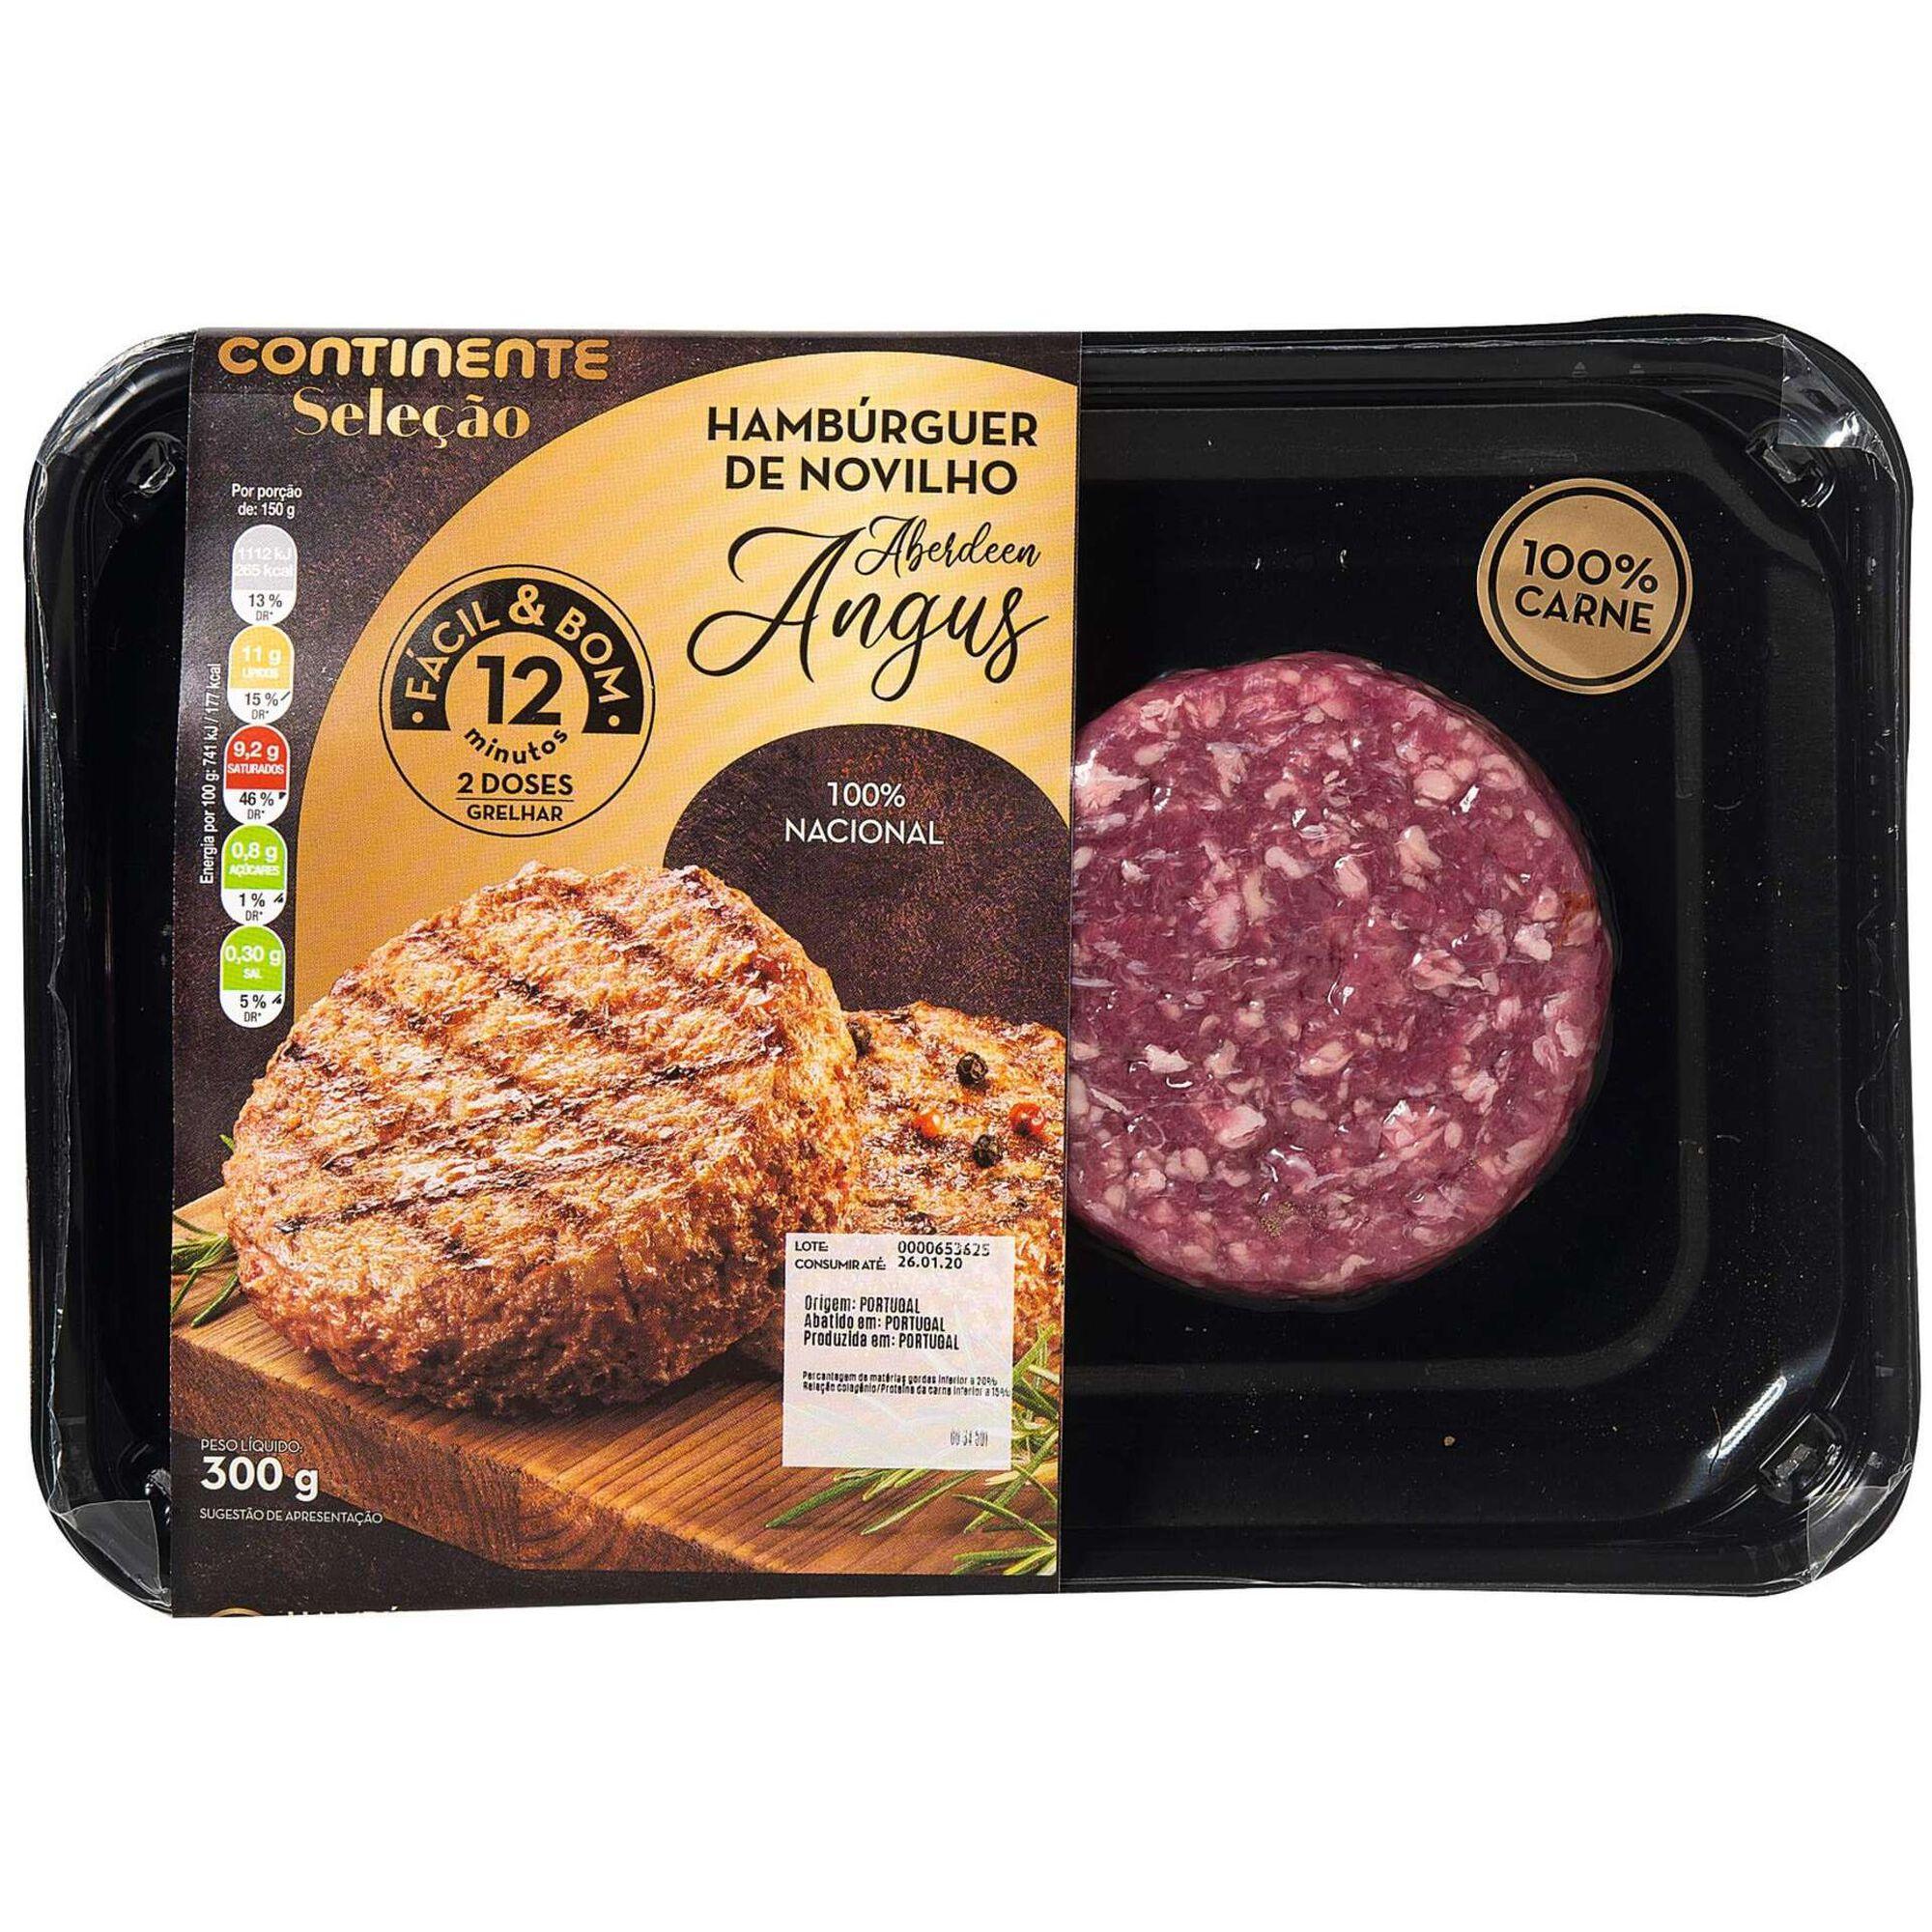 Hambúrguer 100% Carne de Novilho Angus